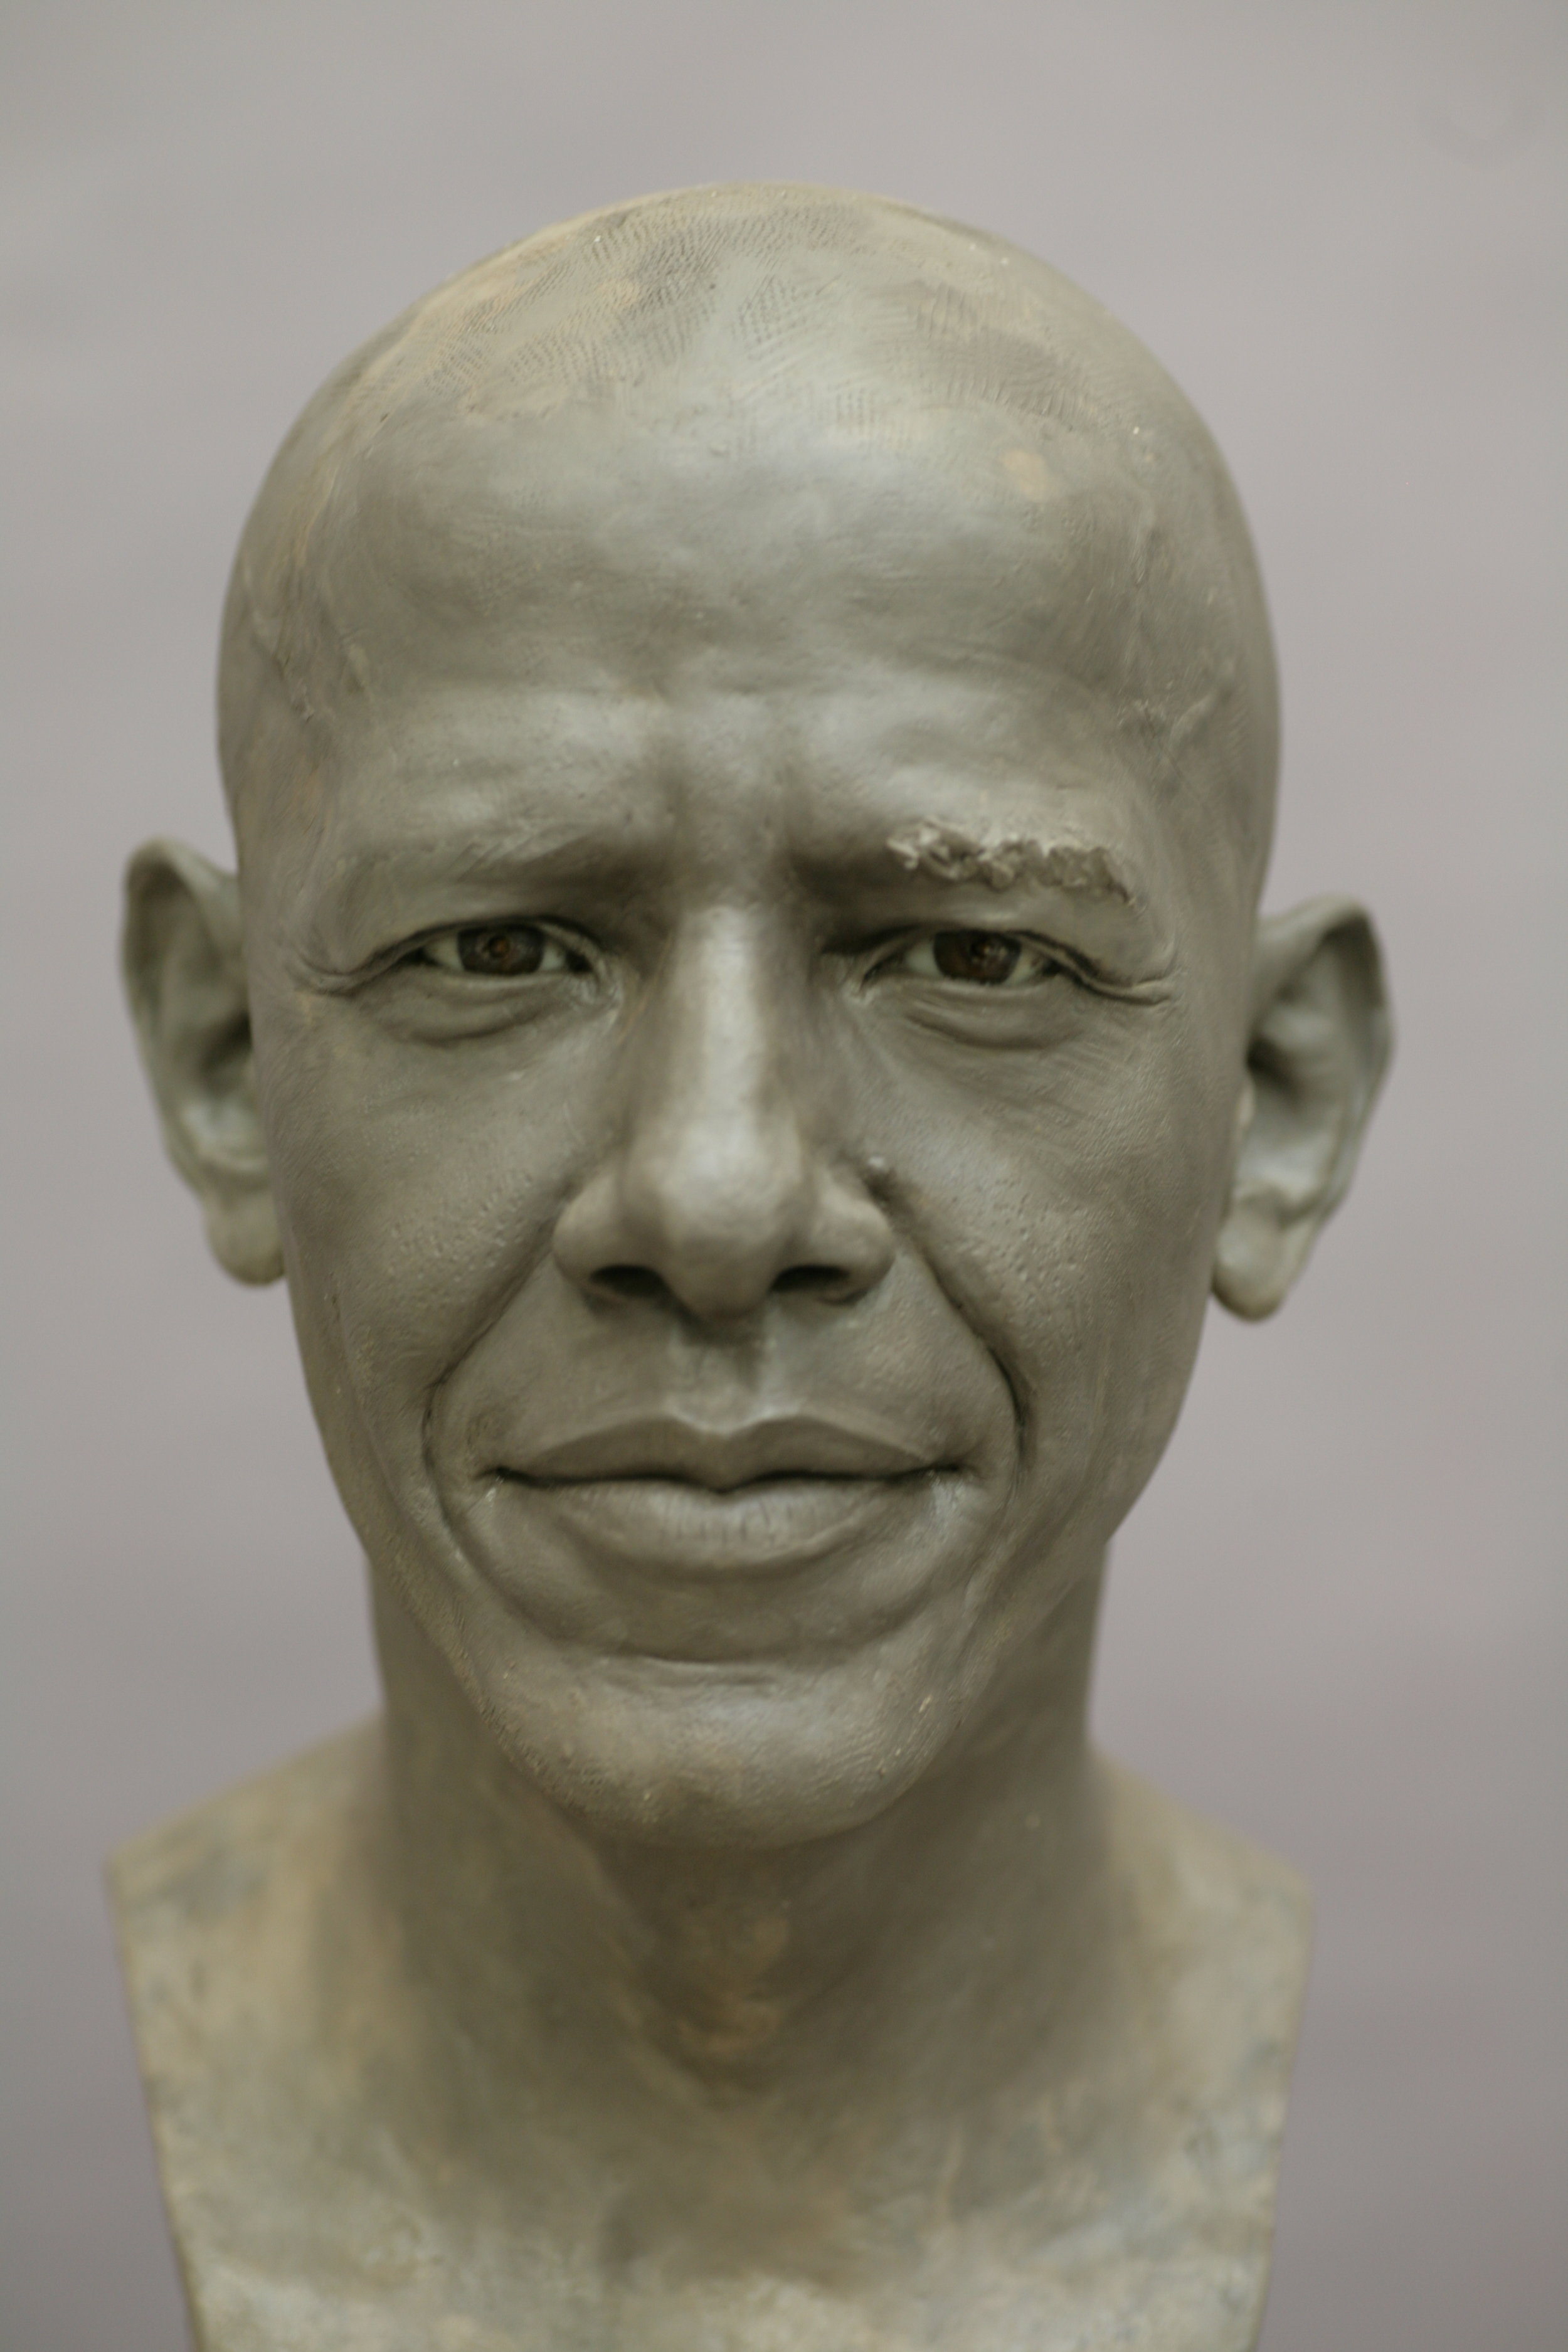 Barack Obama - Clay sculpture by Eric Saint Chaffray - Credit Musée Grévin